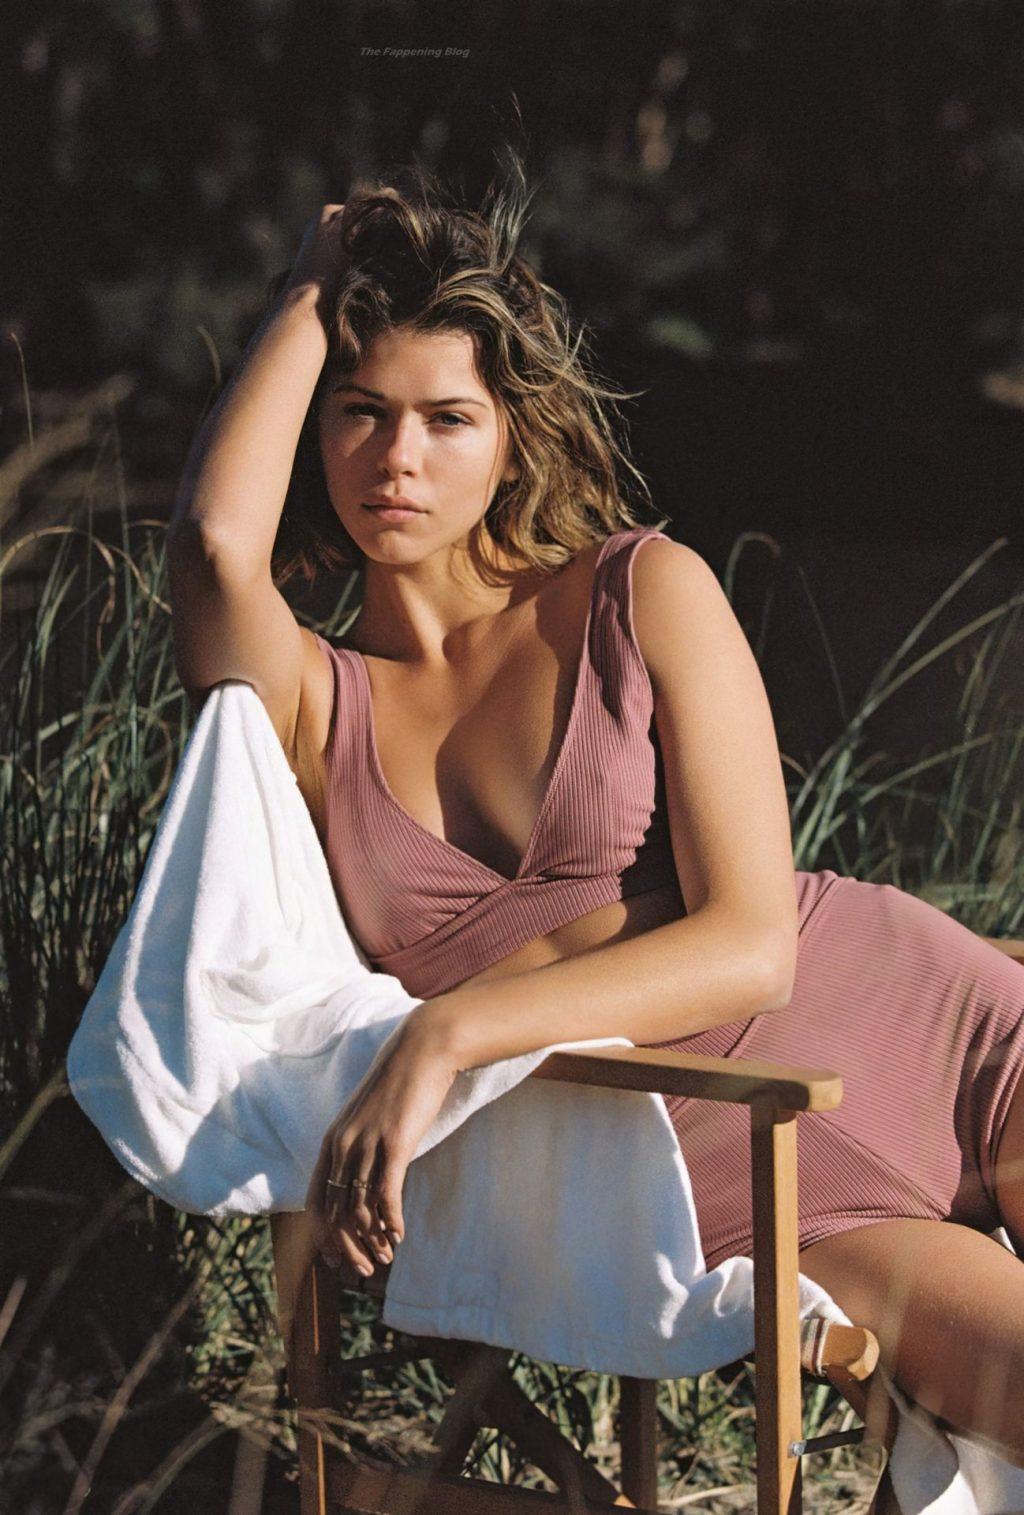 Georgia Fowler Poses for a New Swimwear Brand Juillet Swimwear Campaign (40 Photos)